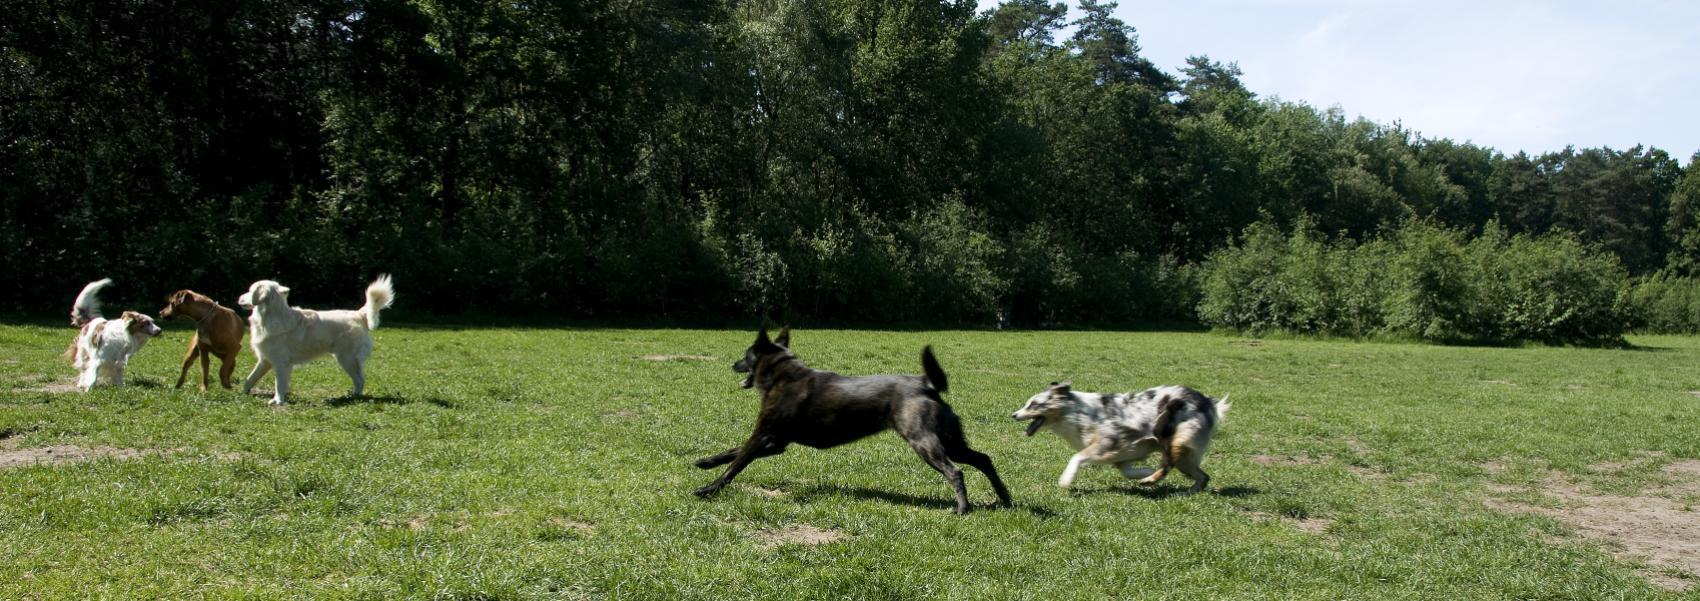 Hondenzone in de Brusselse Bossen